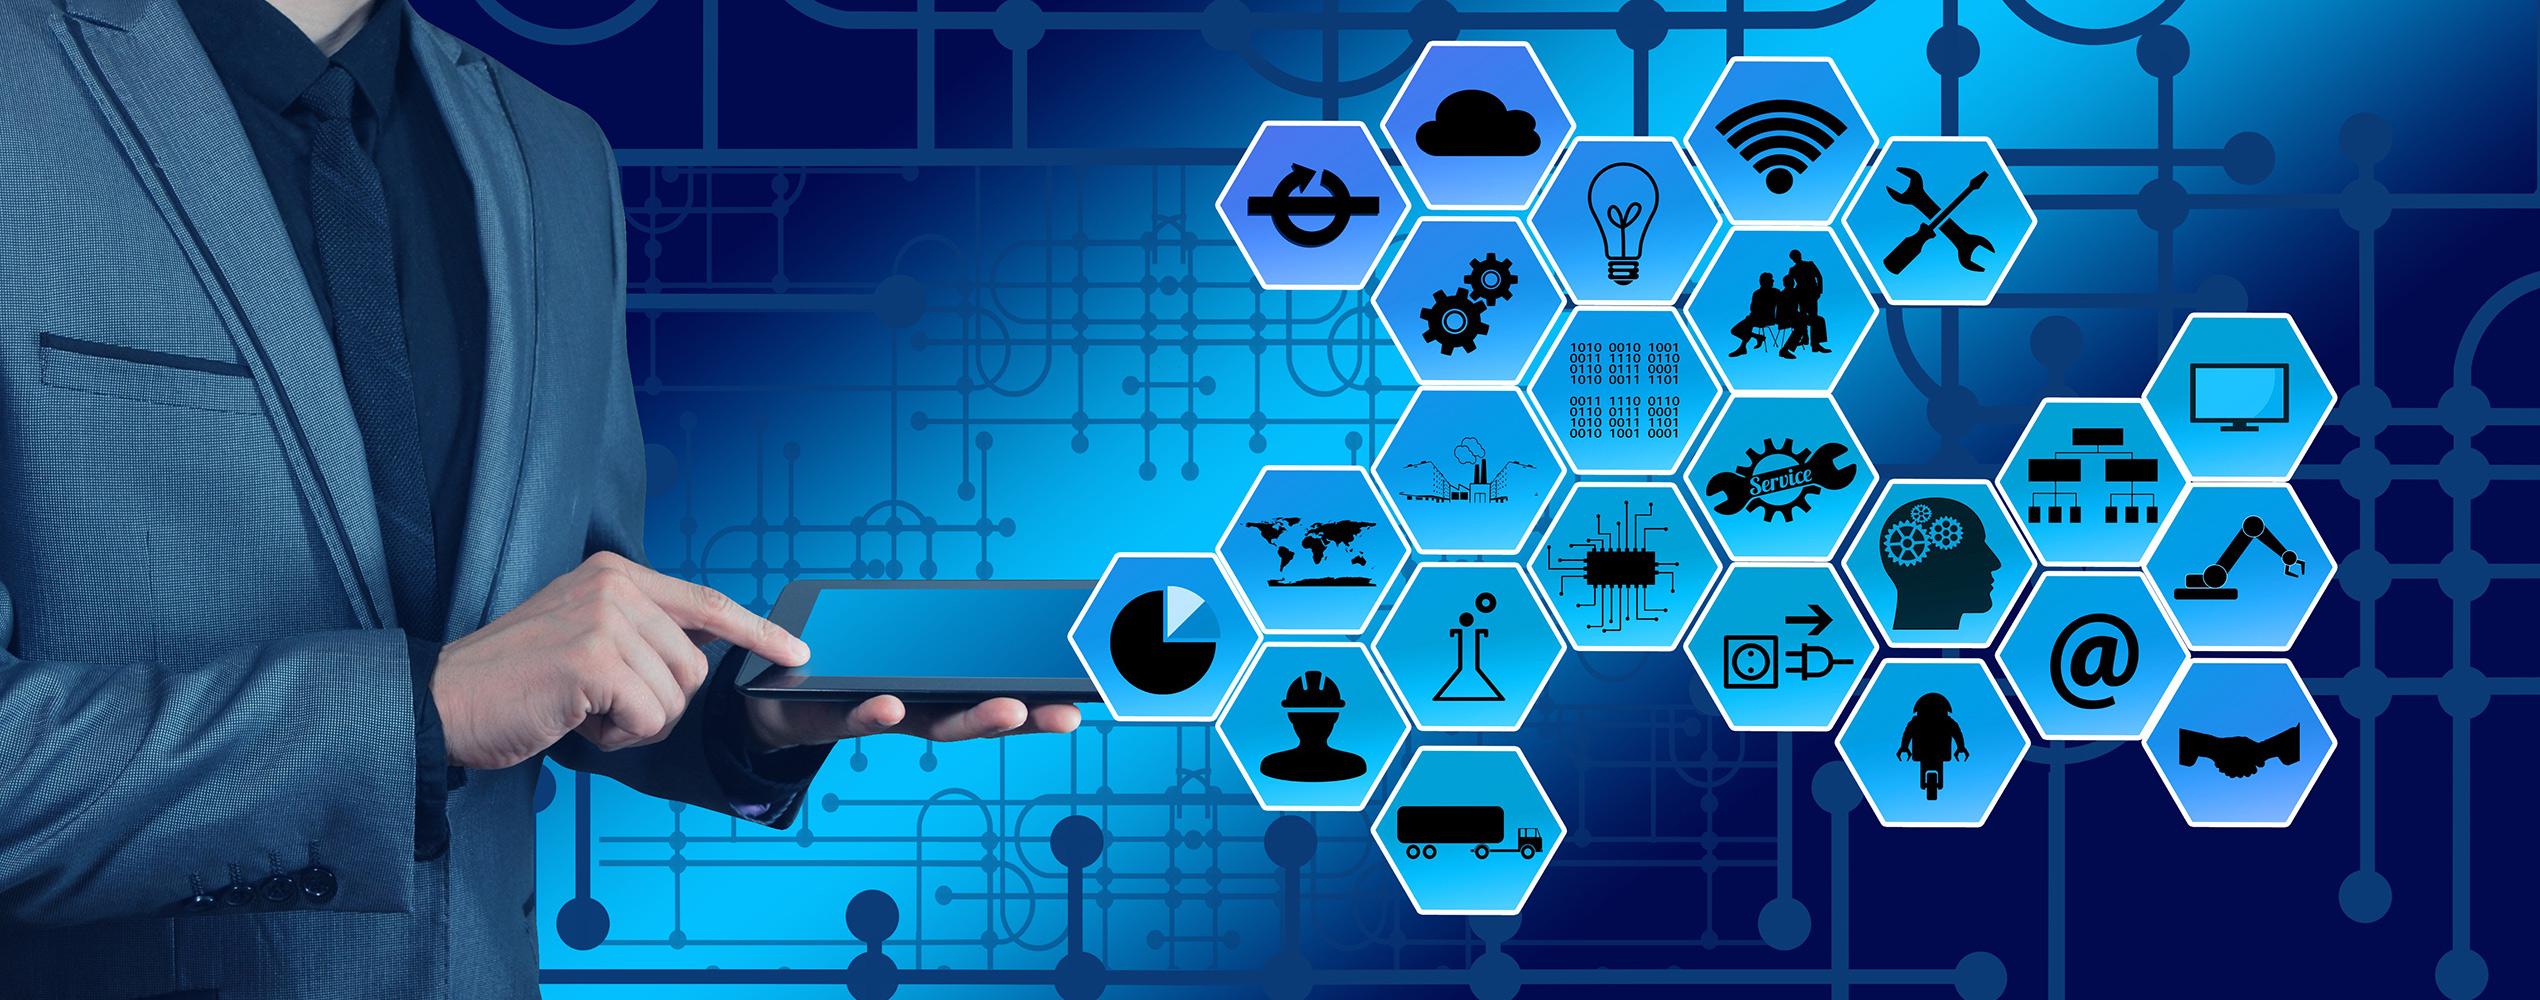 HEADER-pixabay-geralt-industry-3087393-2540x1000